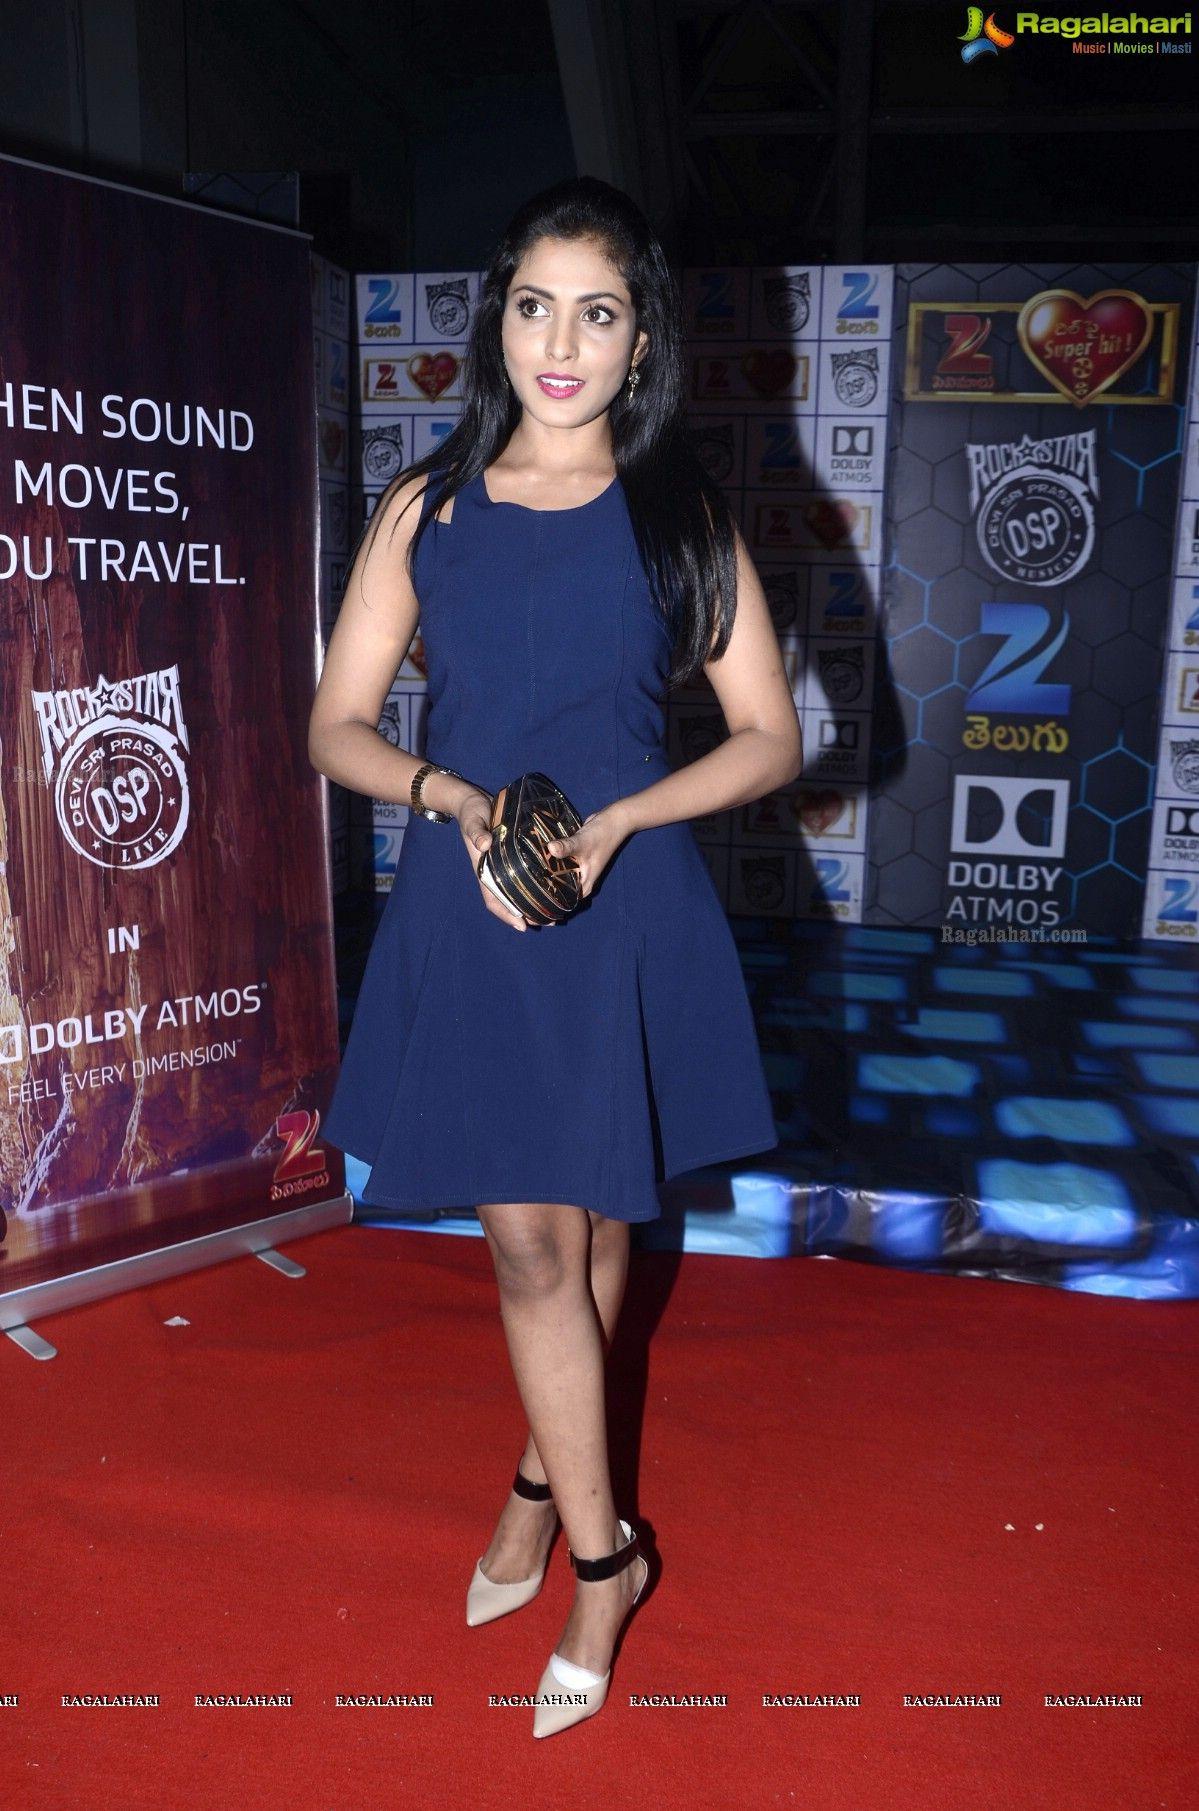 Madhu Shalini Hot Sex Stunning photos - madhu shalini | frock and mini skirt, the best dress of